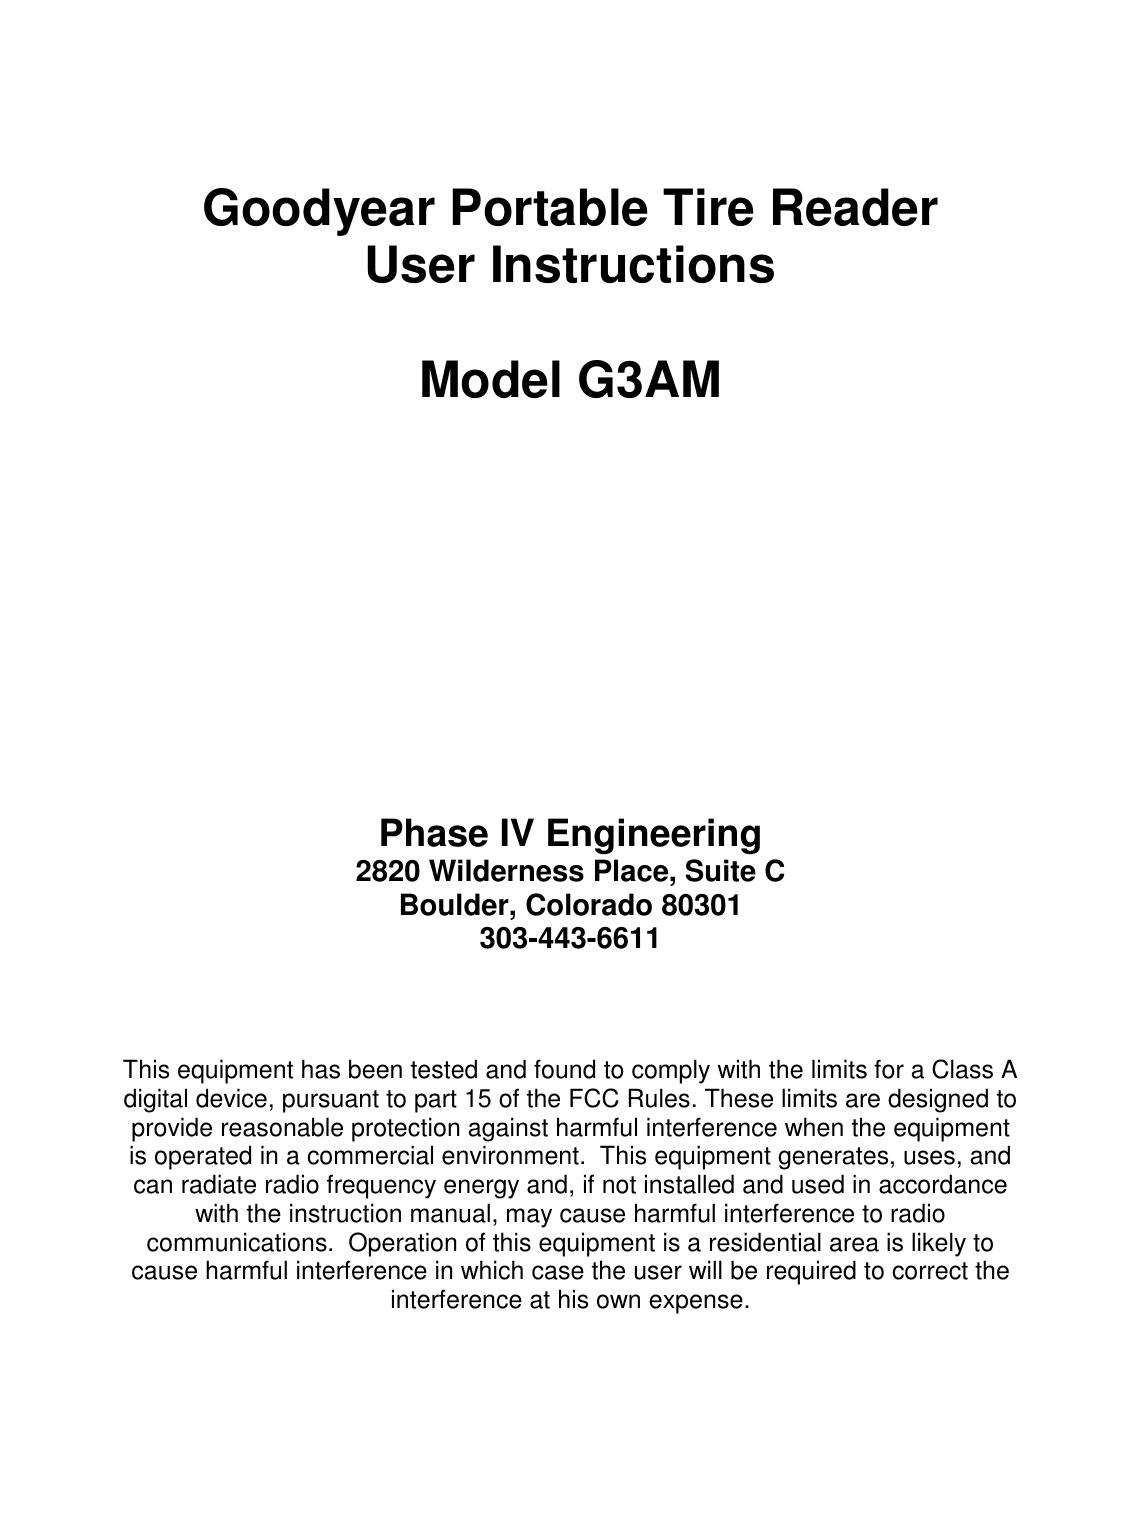 phase iv engineering g3am tire data monitoring system user manual rh usermanual wiki Instruction Manual Book Operators Manual